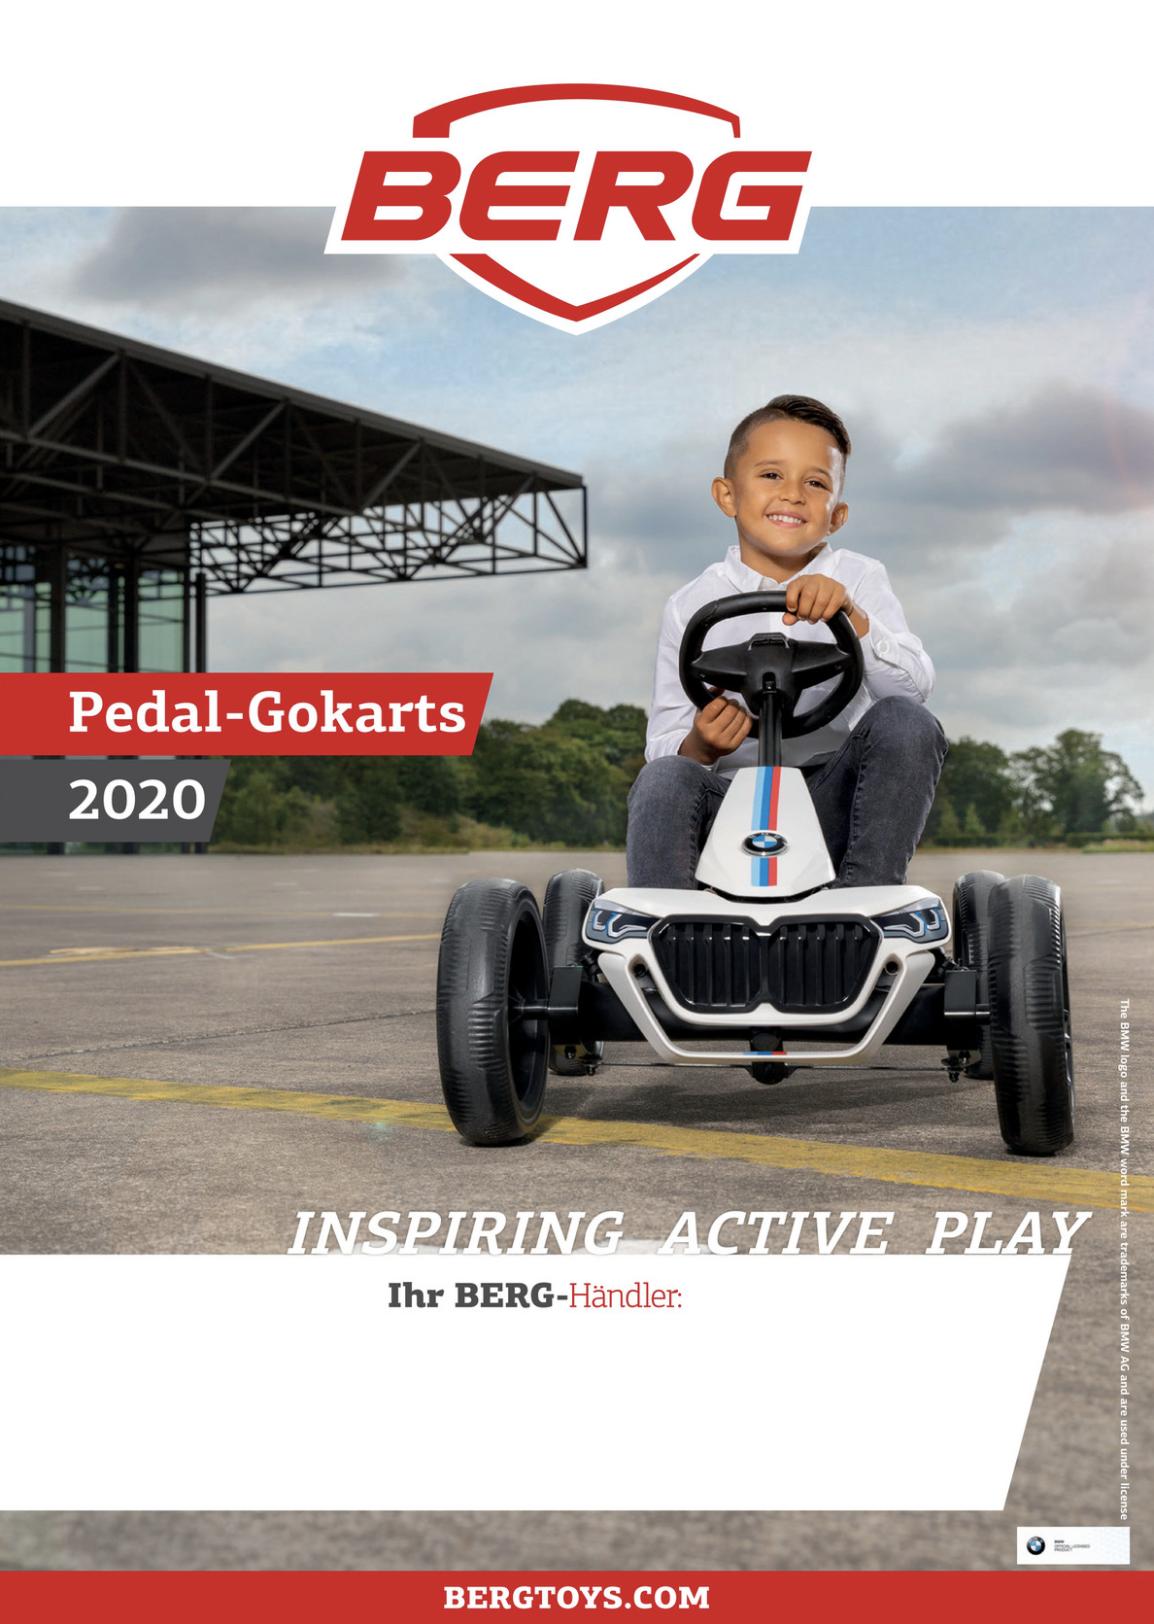 BERG-Gokart-Katalog-2020